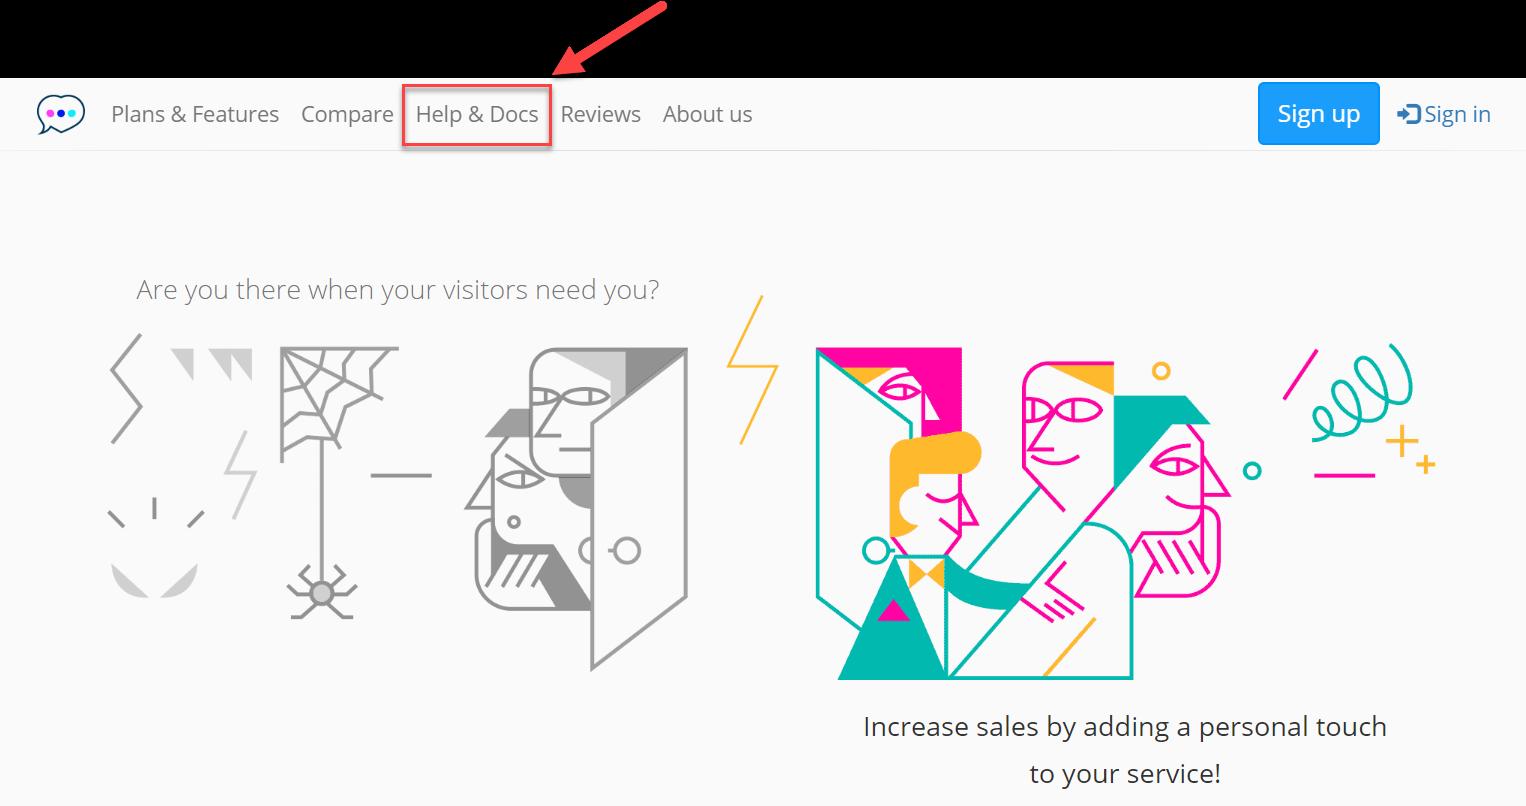 Chatra's website 'Help & Docs' button